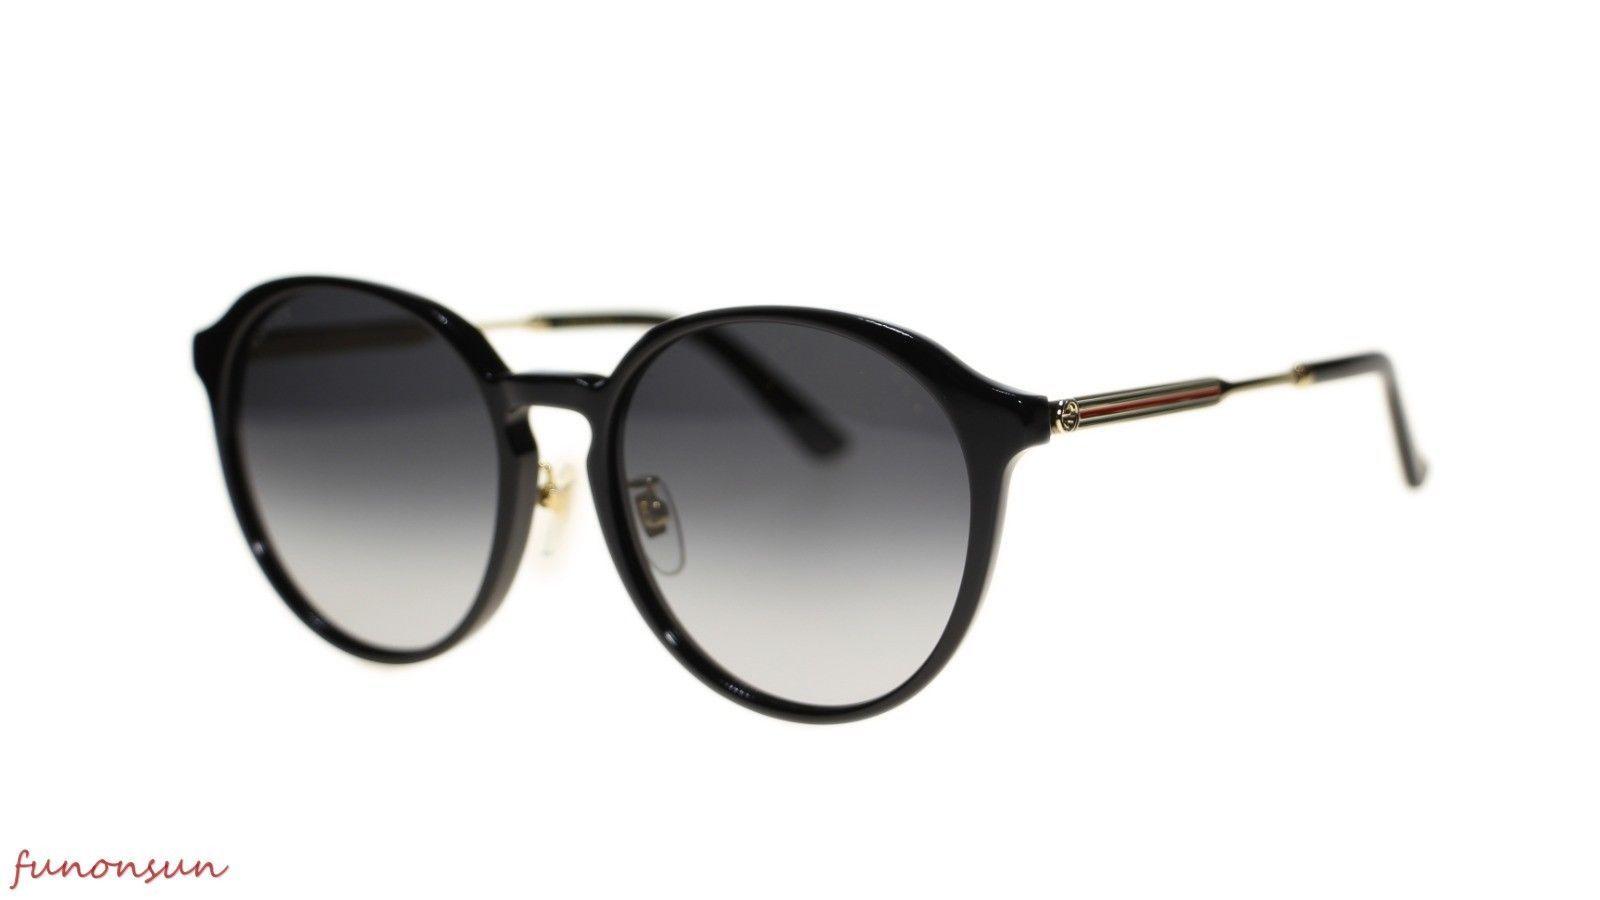 e238bde1eeb 10. 10. Previous. New Gucci Unisex Sunglasses GG0205SK 001 Black Grey Lens  Round 57mm Authentic